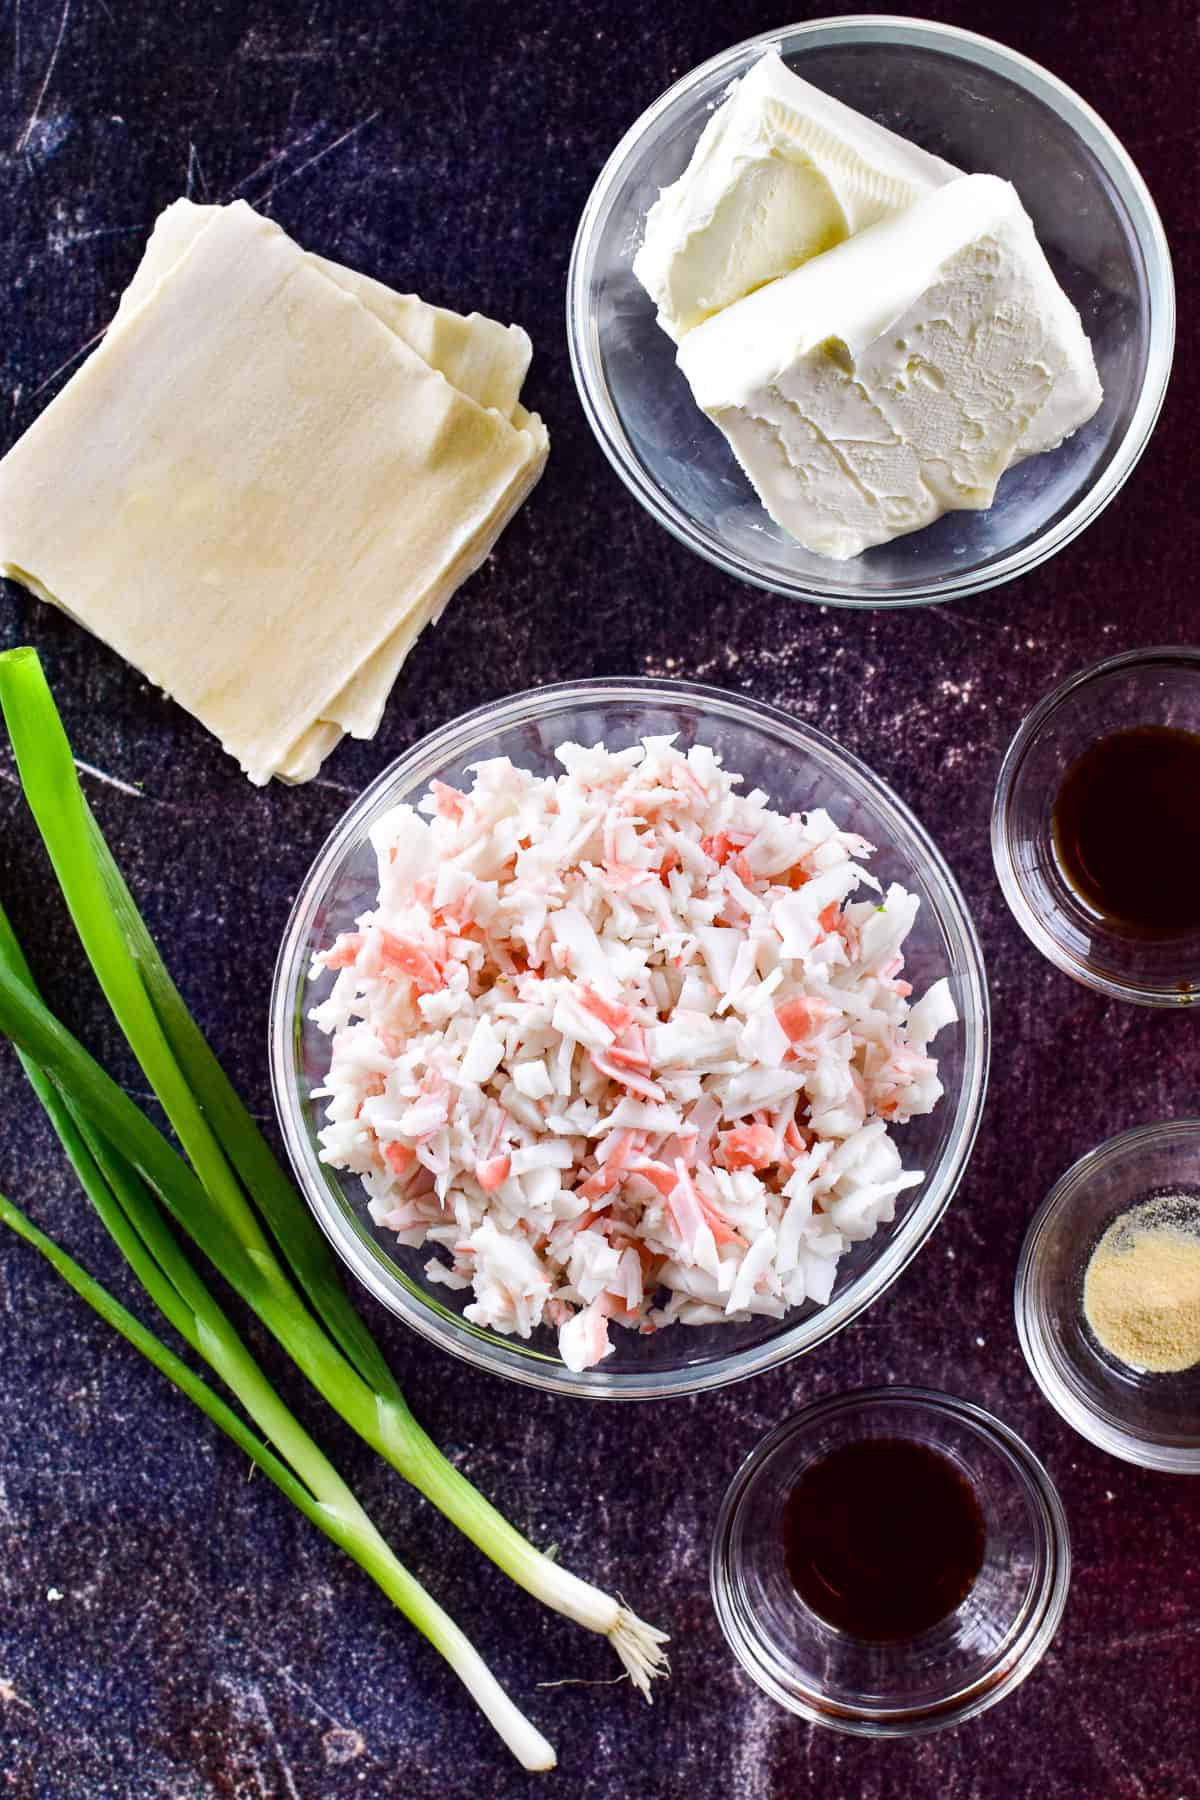 Crab Rangoon ingredients